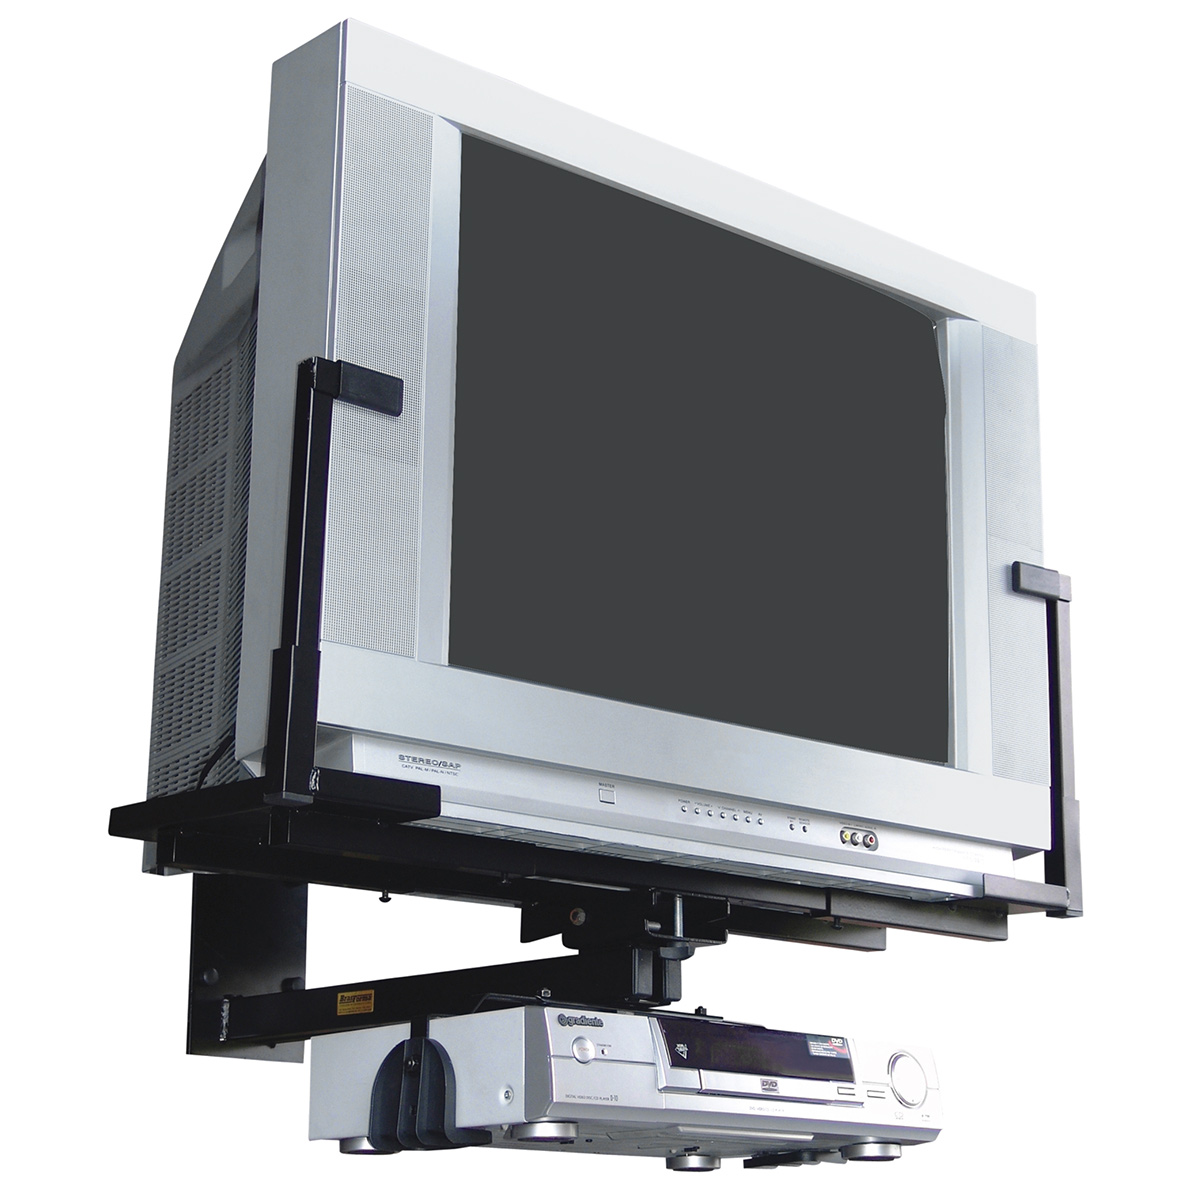 SBR1.6 - Suporte de Parede p/ TV CRT 21 a 33 c/ DVD SBR 1.6 - Brasforma